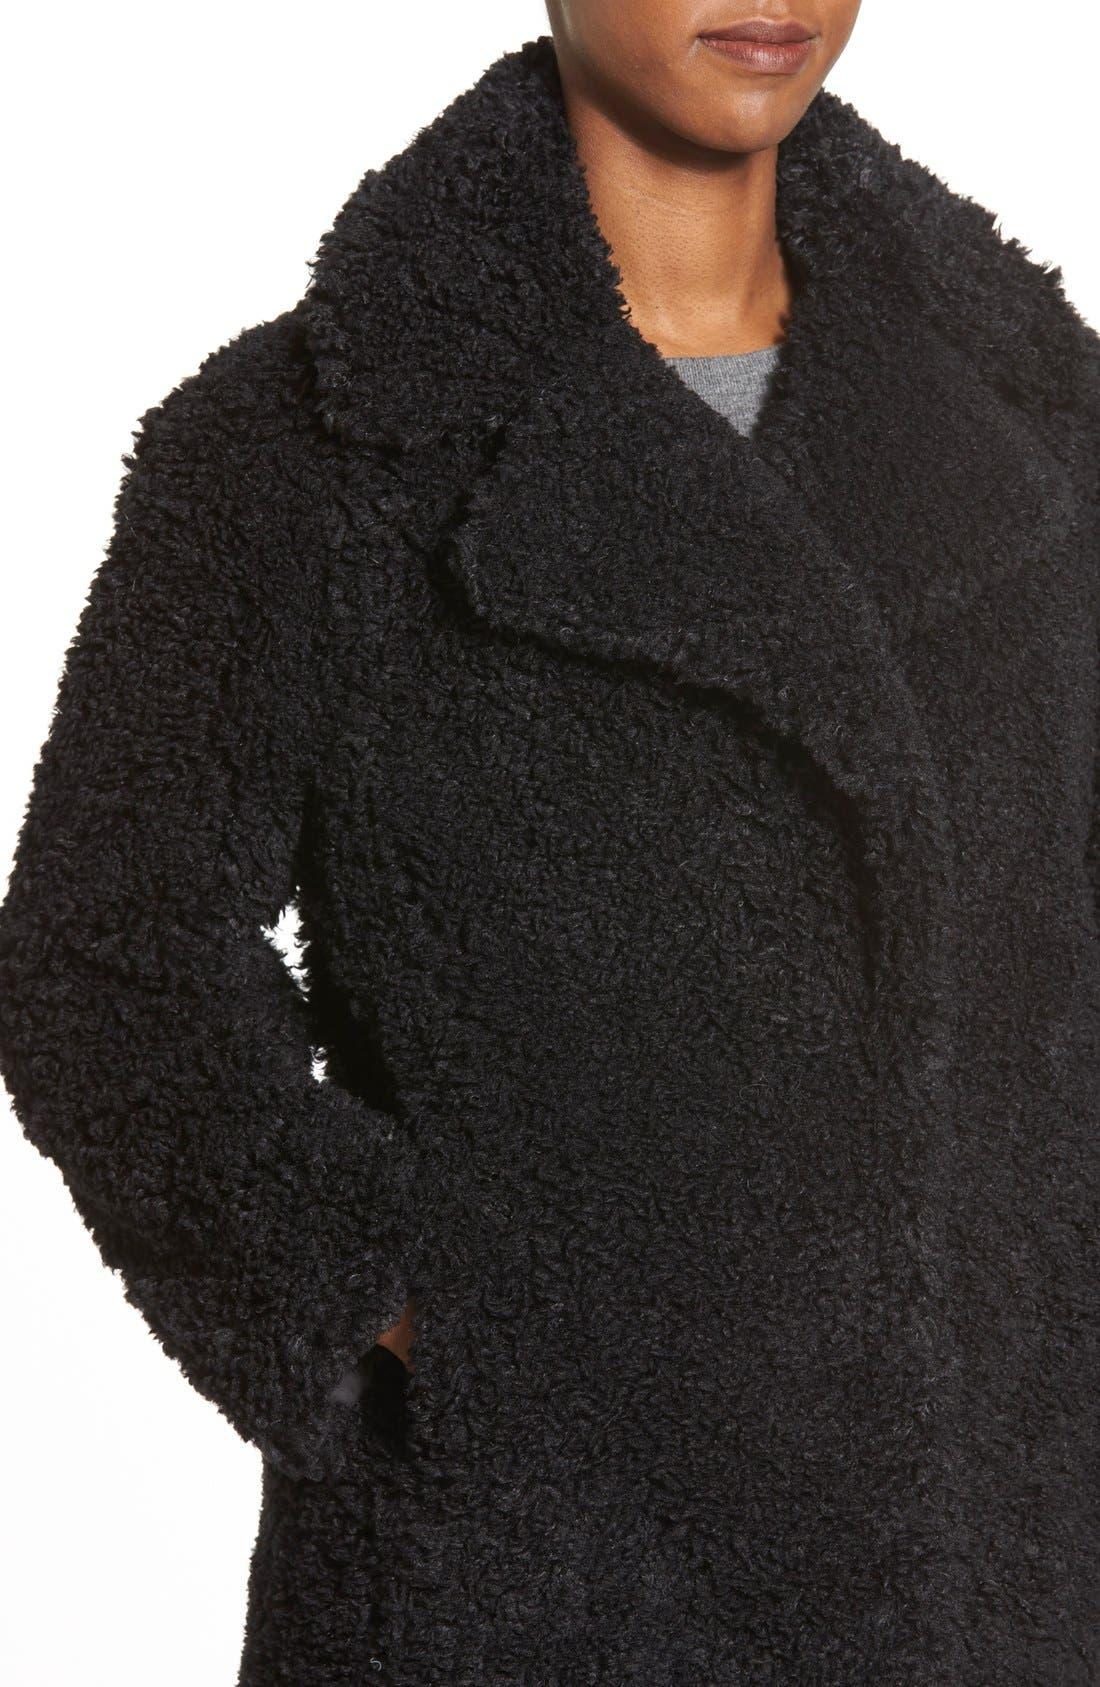 'Teddy Bear' Notch Collar Reversible Faux Fur Coat,                             Alternate thumbnail 5, color,                             001